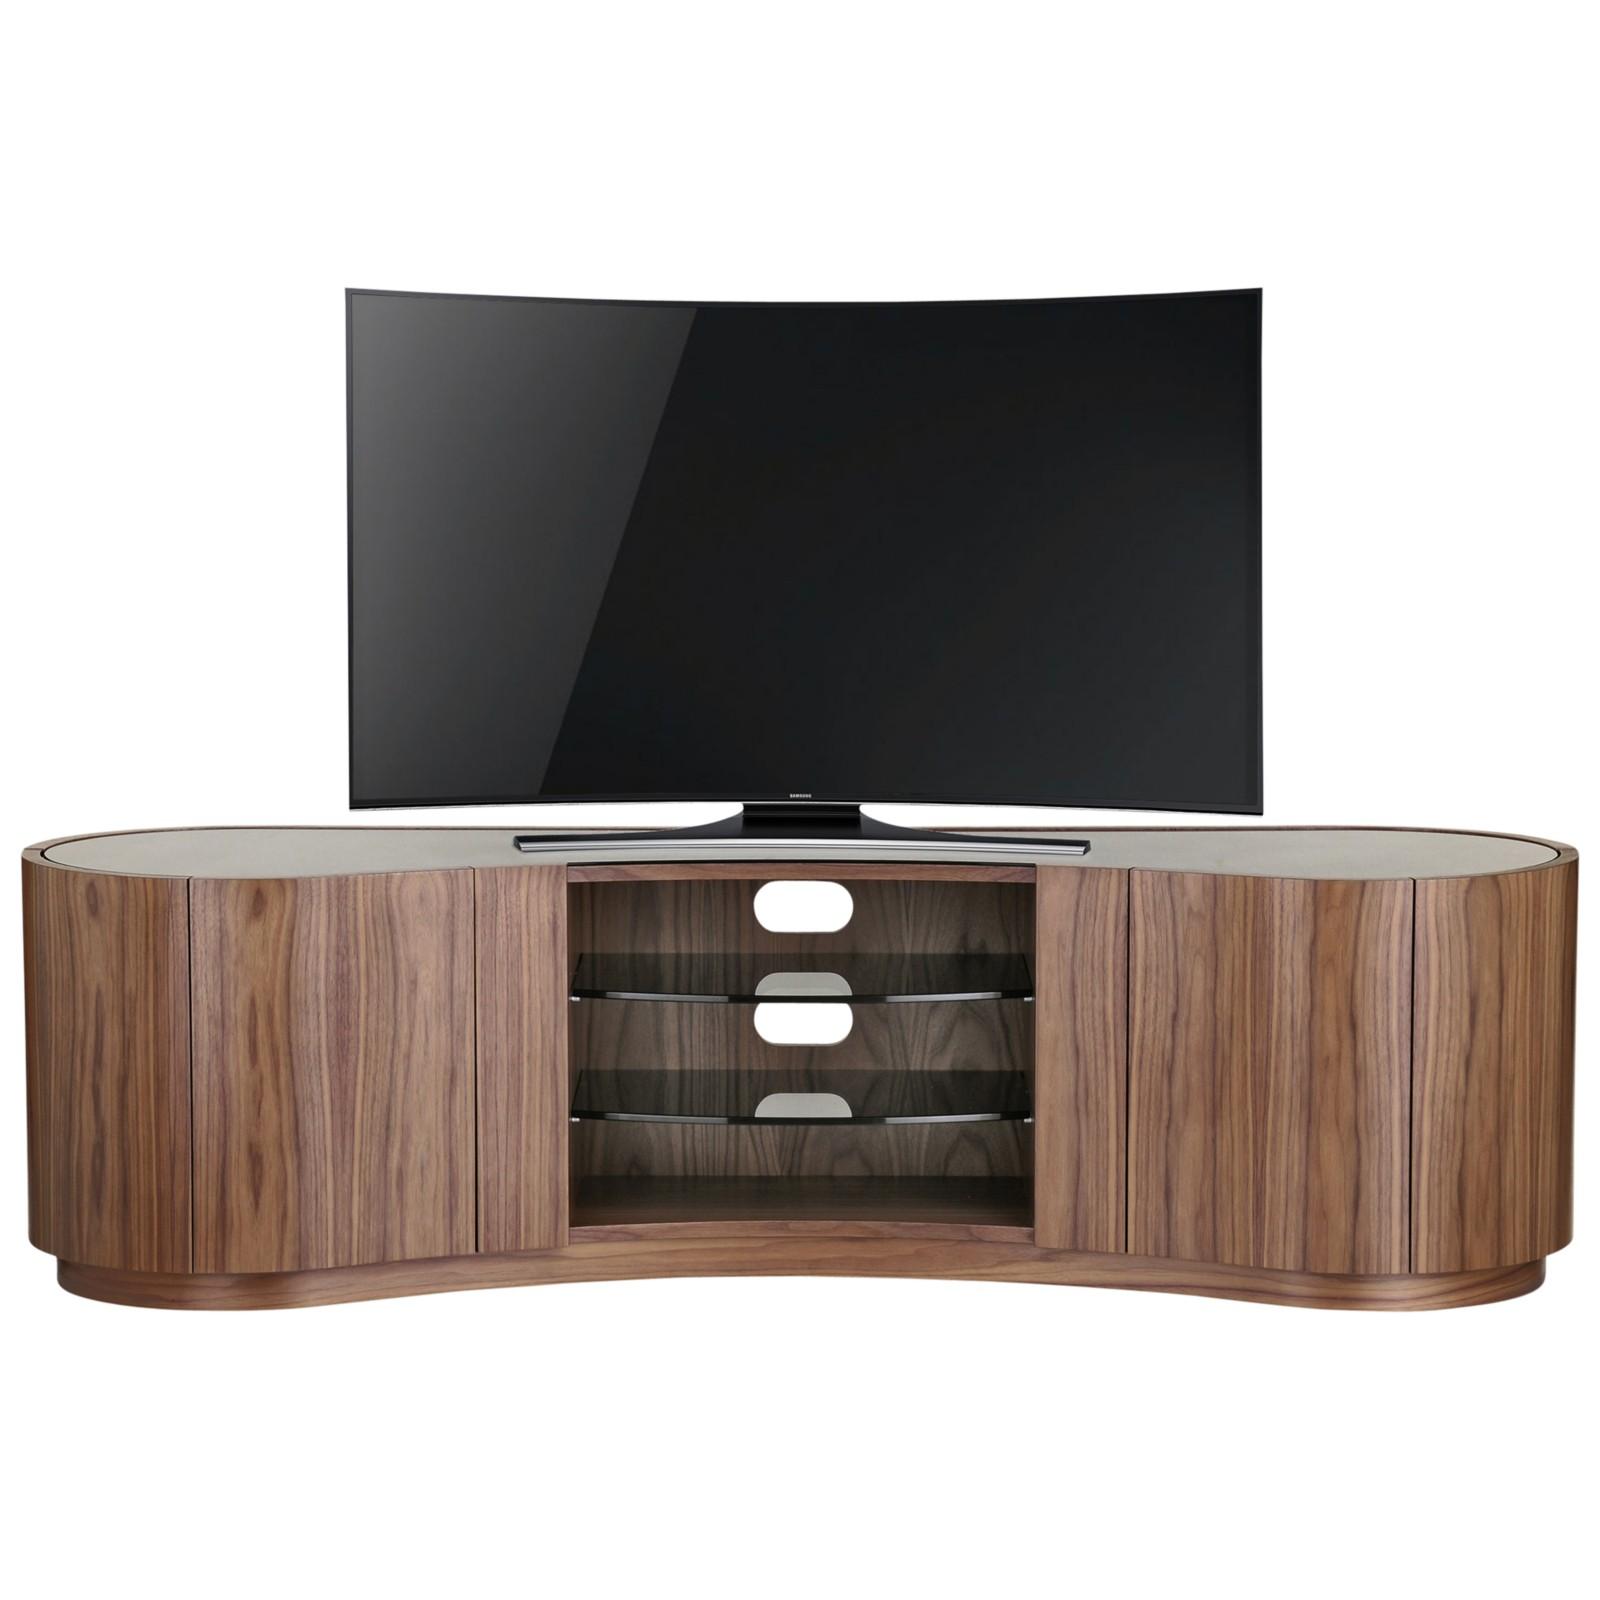 "Tom Schneider Swirl Deluxe 1800 For TVs Up To 75"" Natural walnut"